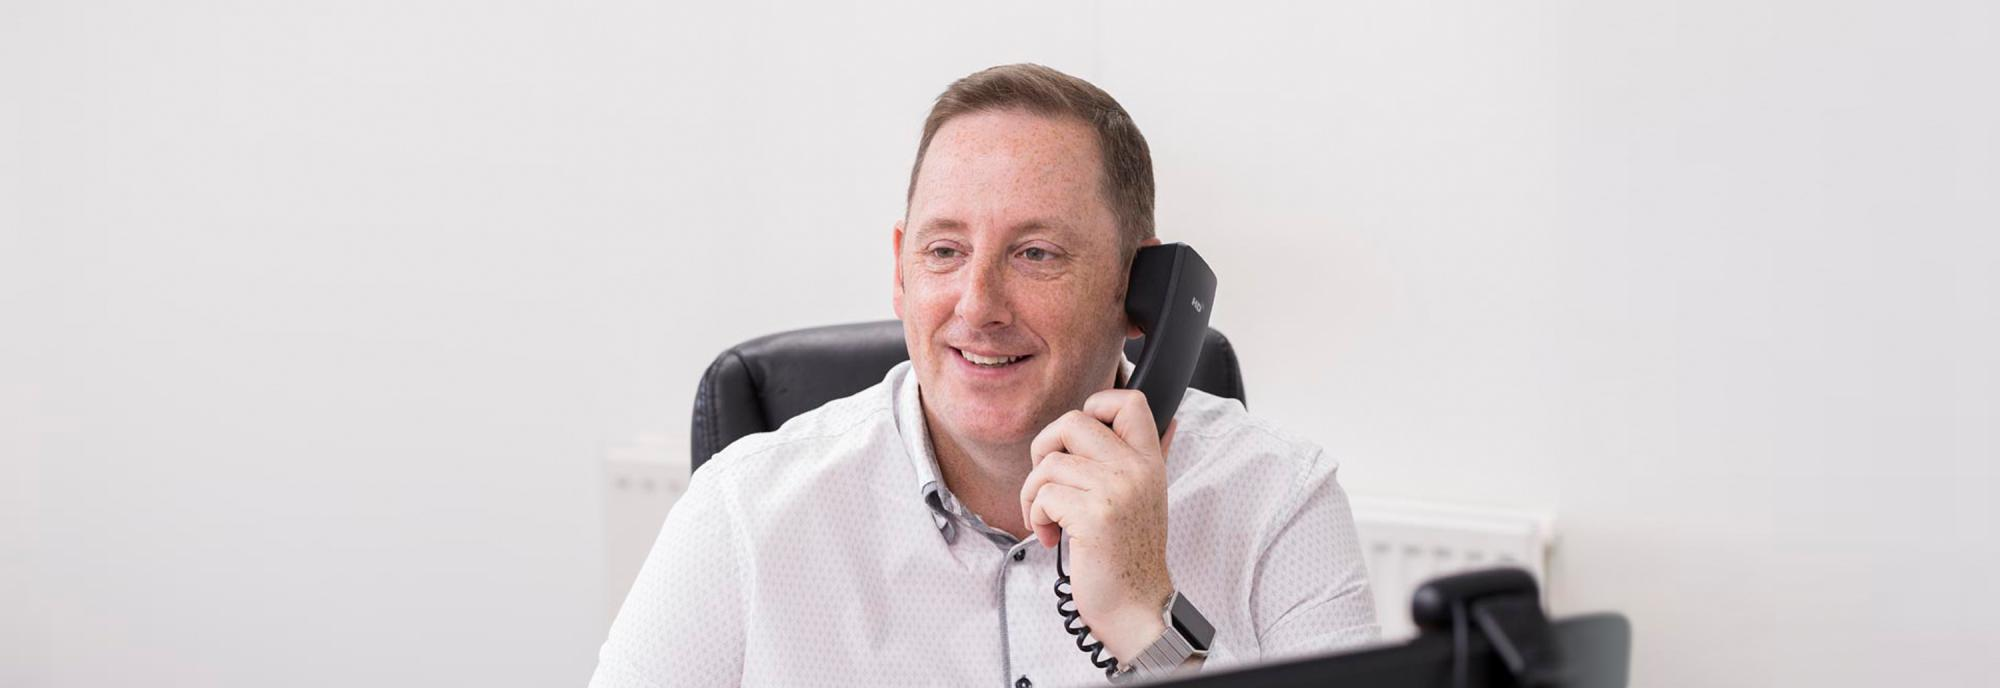 Alan Hickson, Operations Director